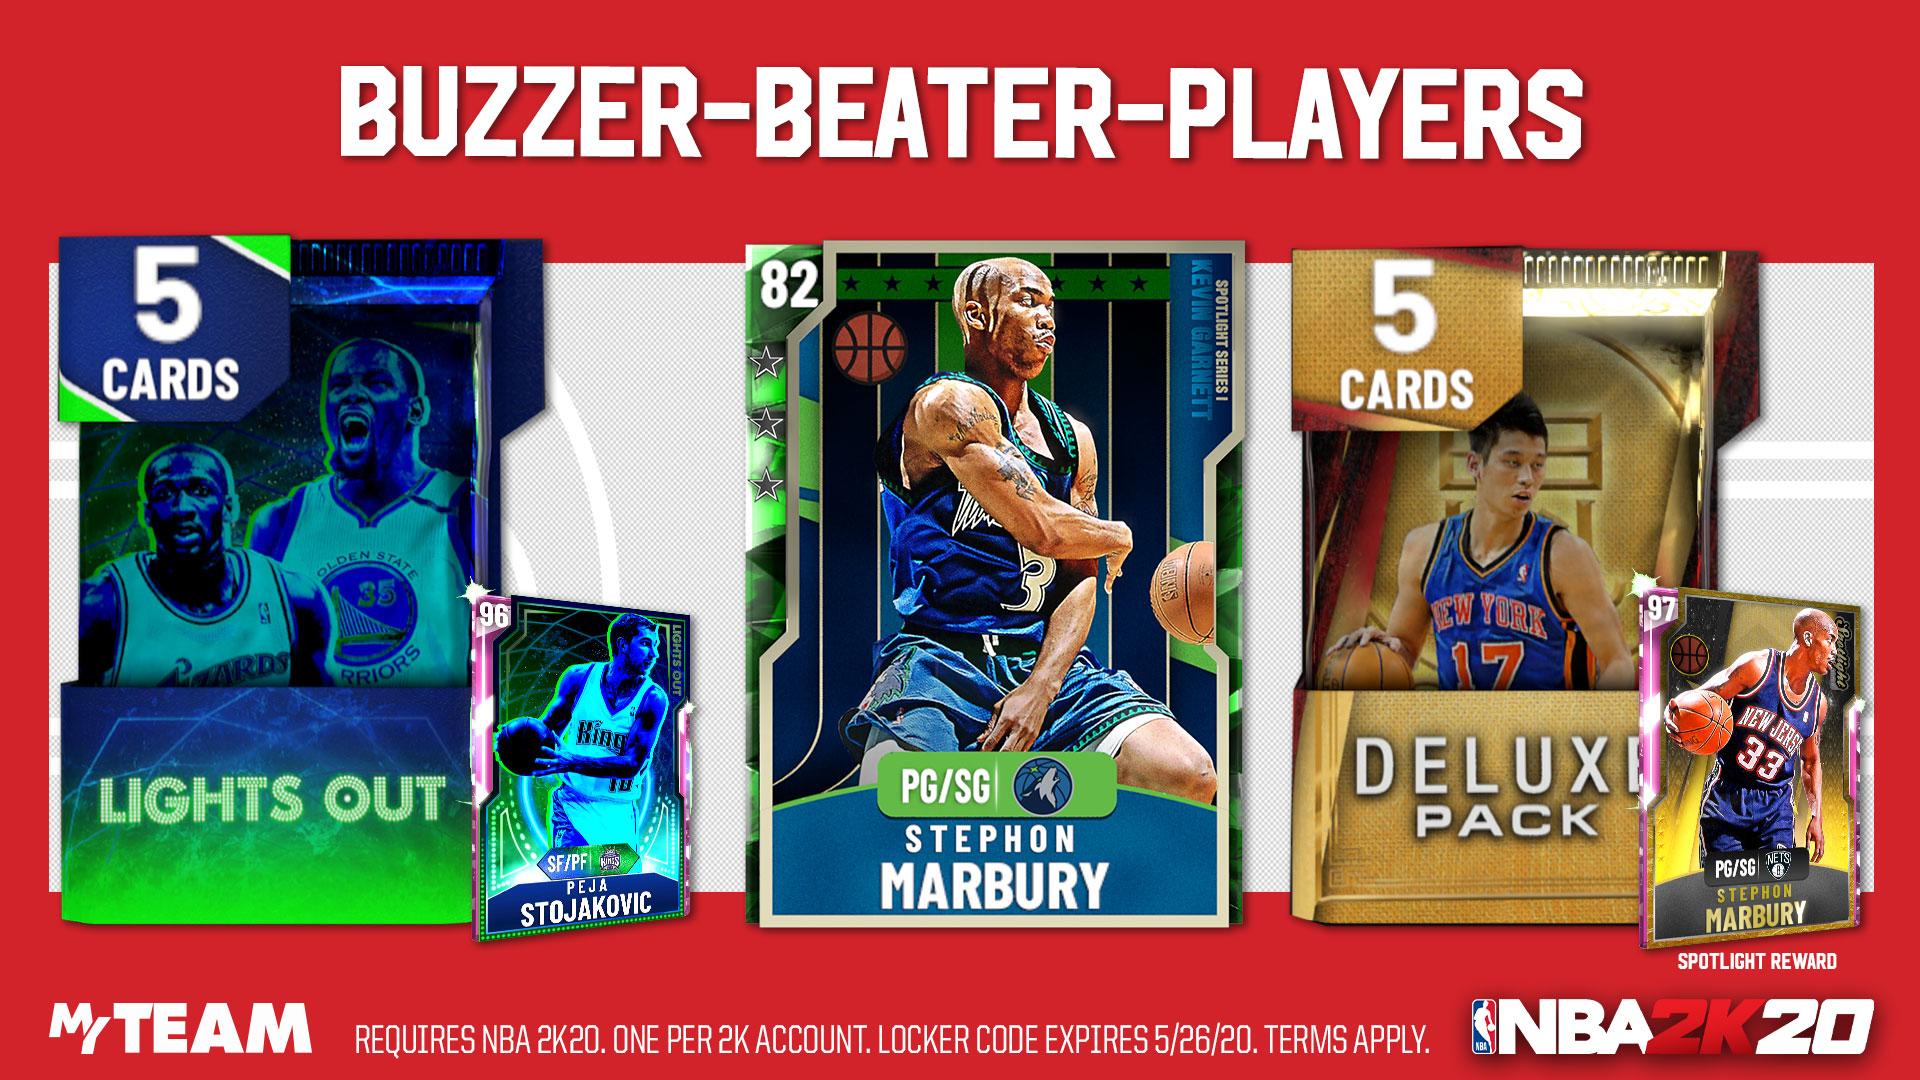 buzzer-beater-locker-code-nba-2k20-myteam